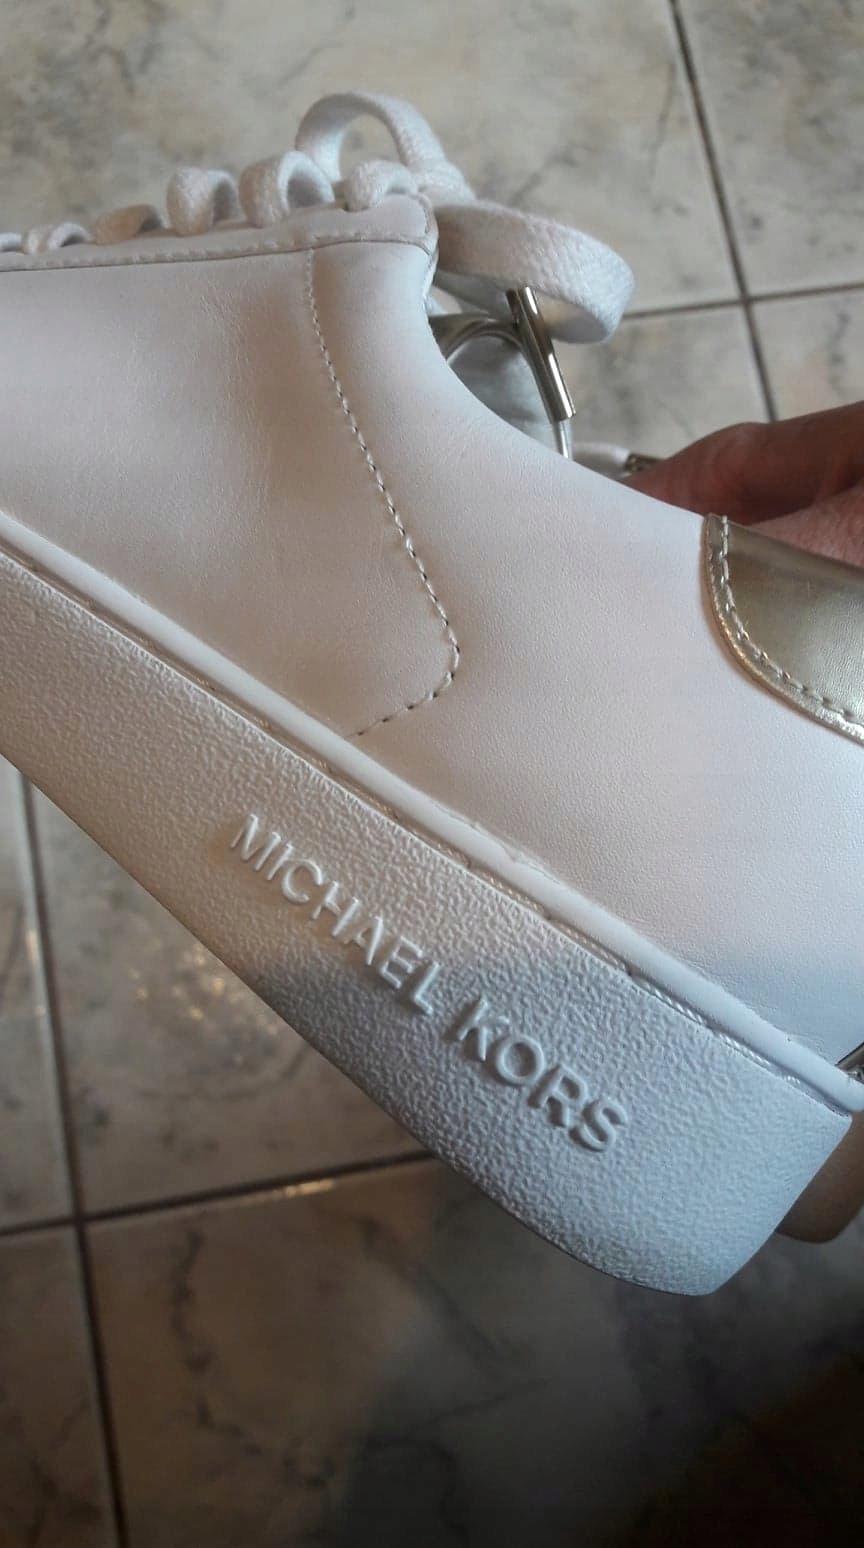 8902e94c30860 Michael Kors - trampki sneakersy, skóra, rozm.39 ! - 7525413773 ...